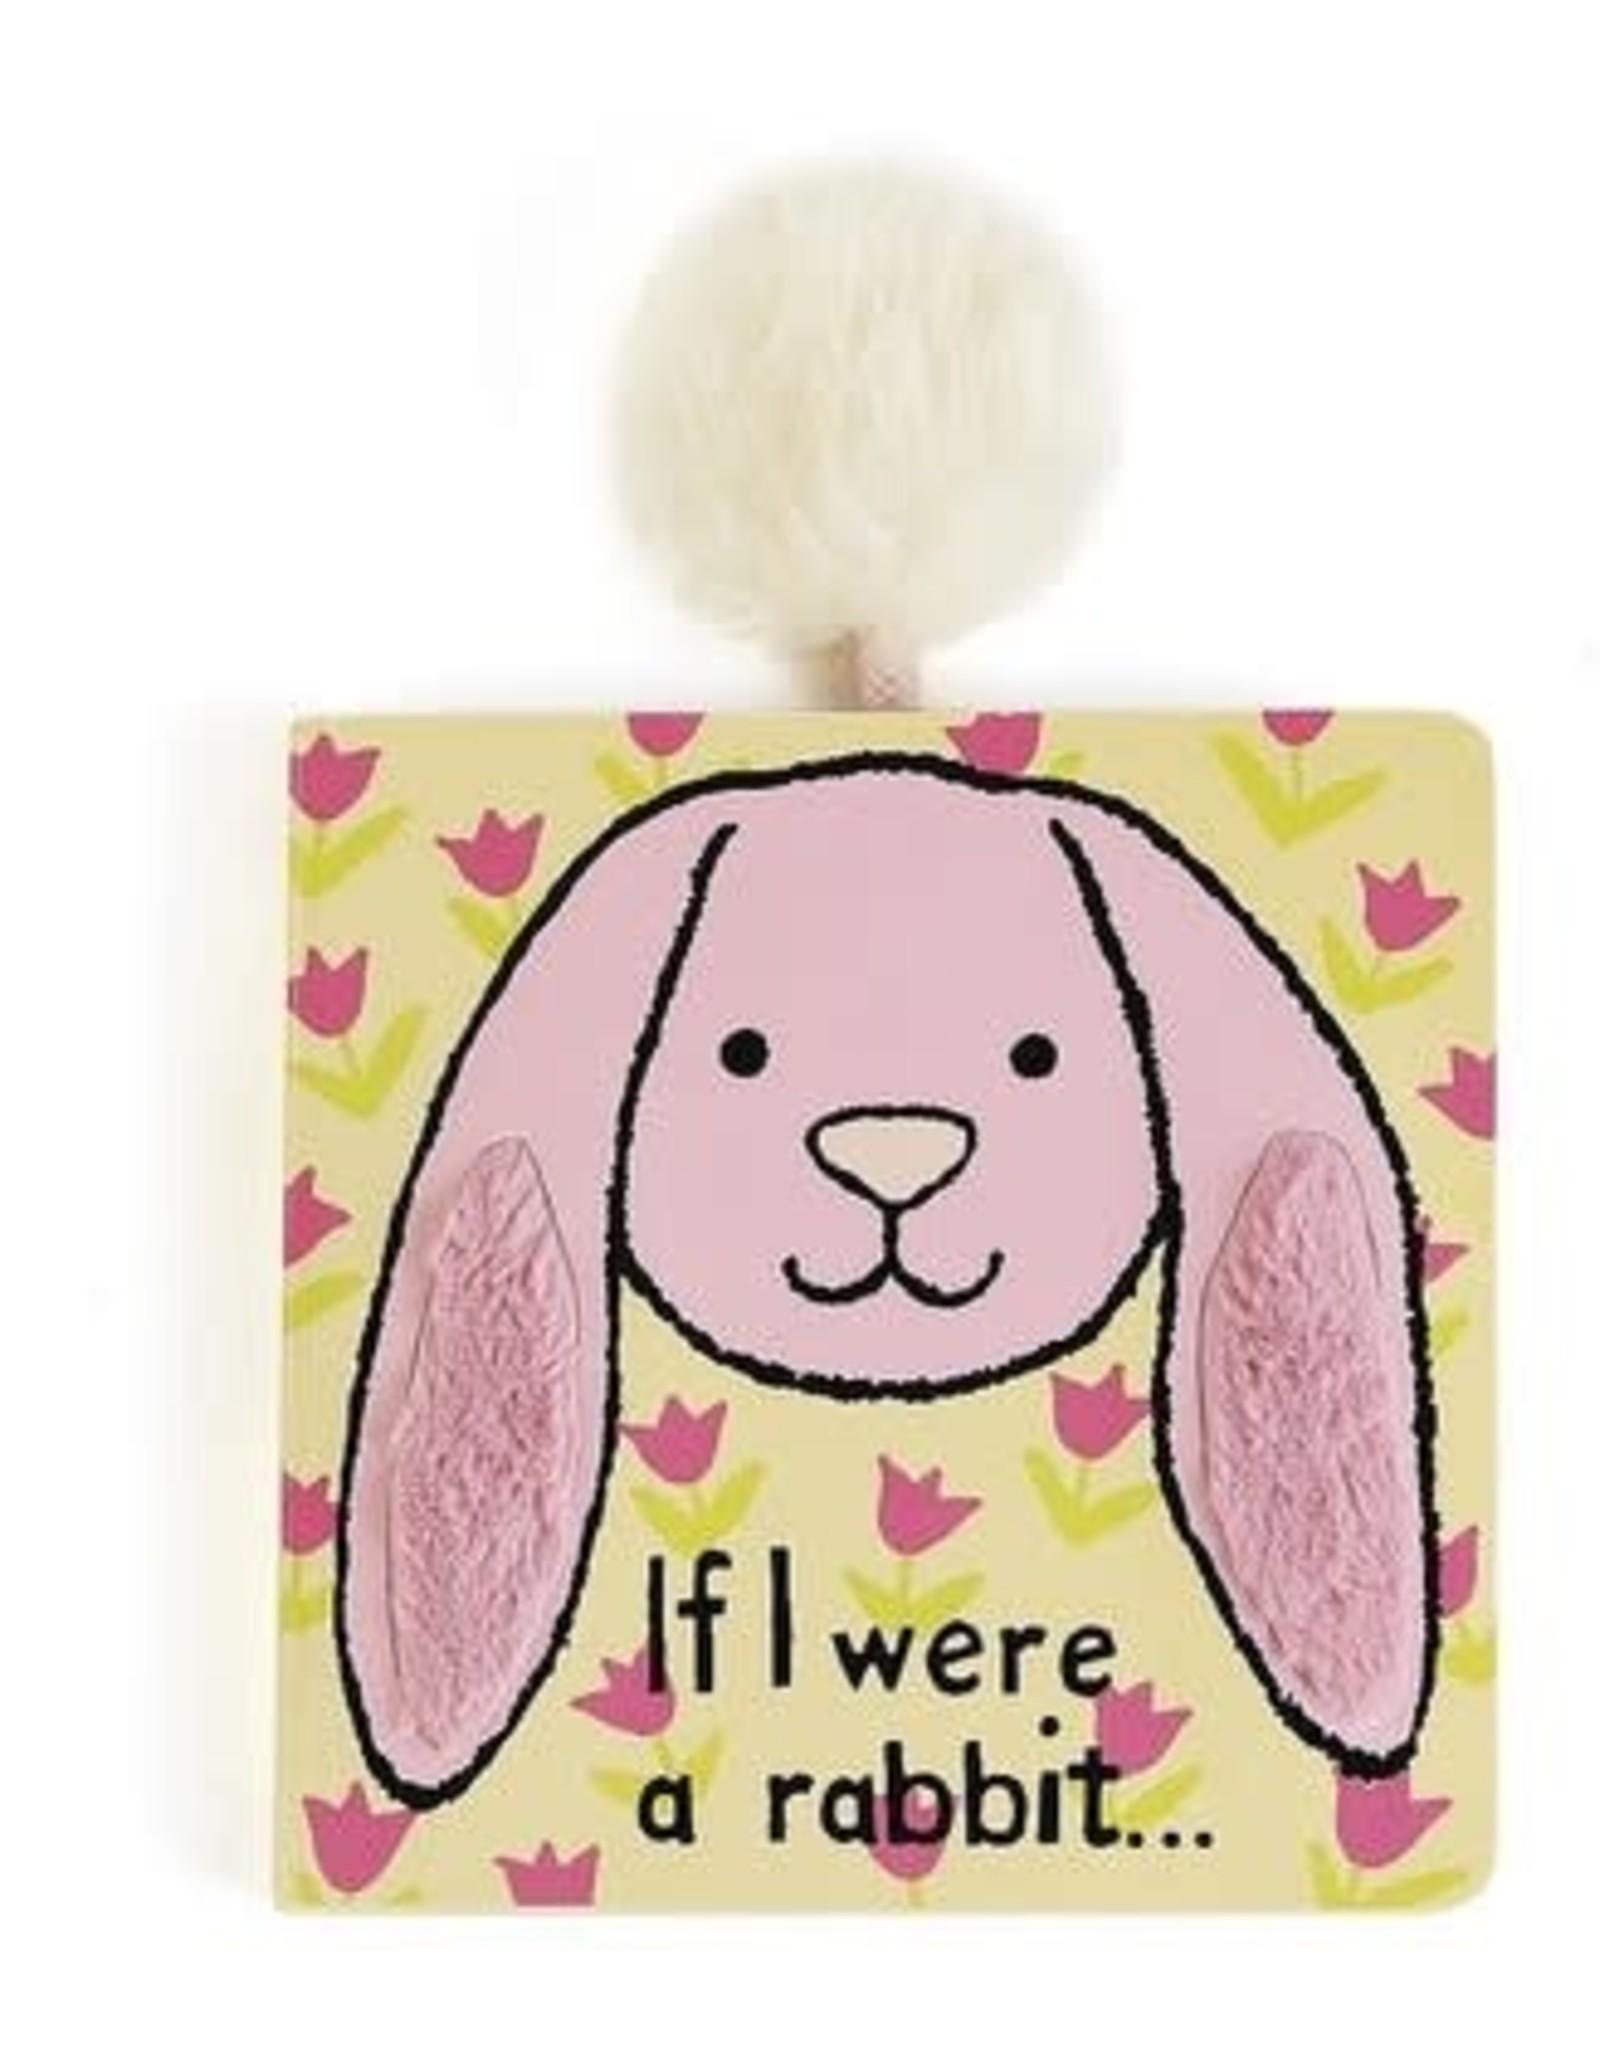 Jellycat Bashful Bunny Book